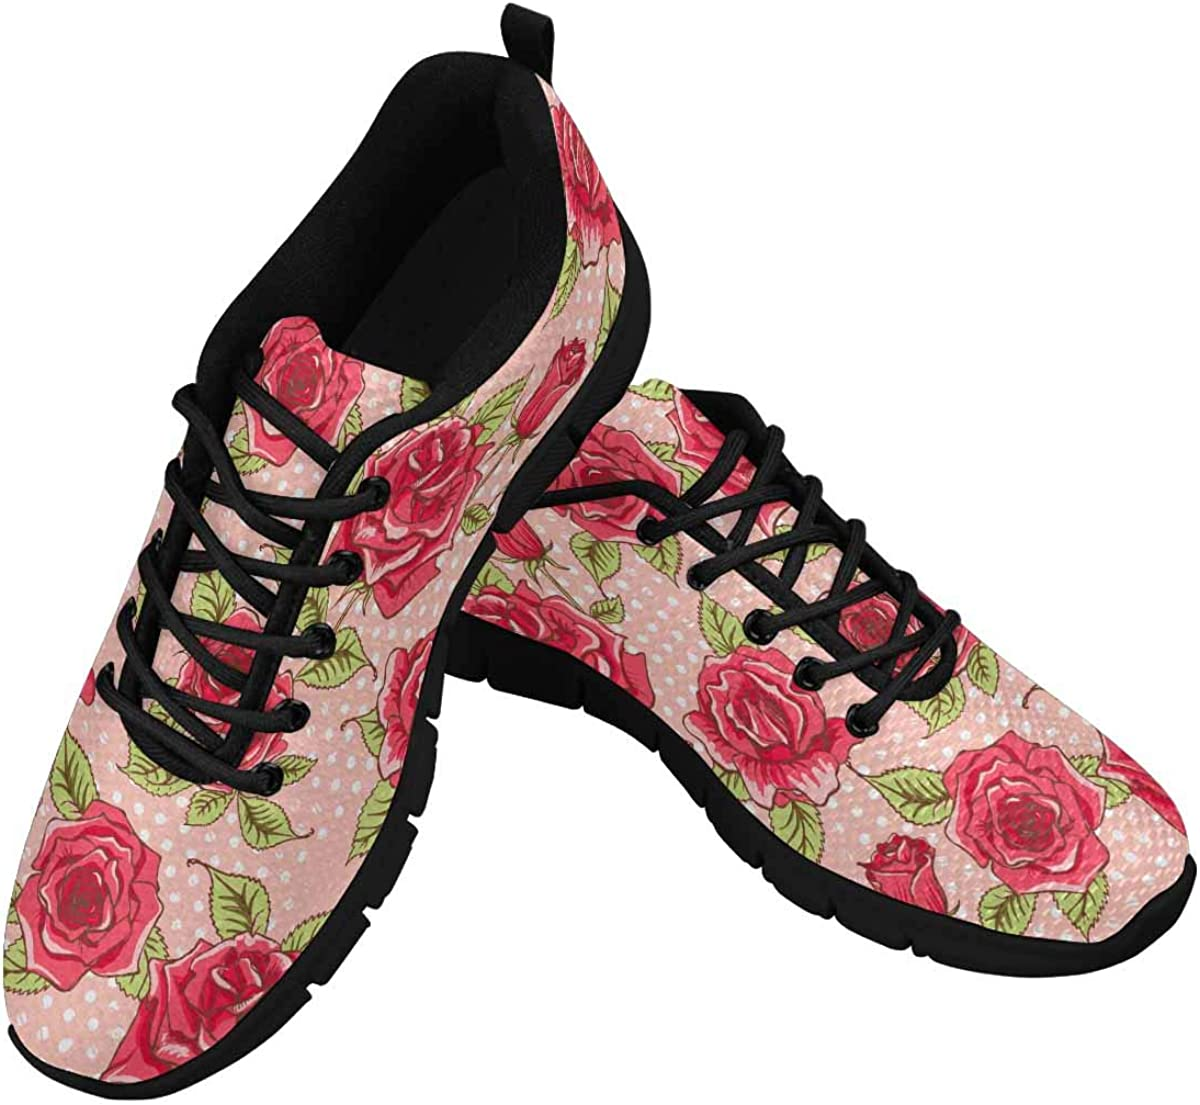 INTERESTPRINT Beautiful Vintage Roses Women's Breathable Non Slip Sneakers